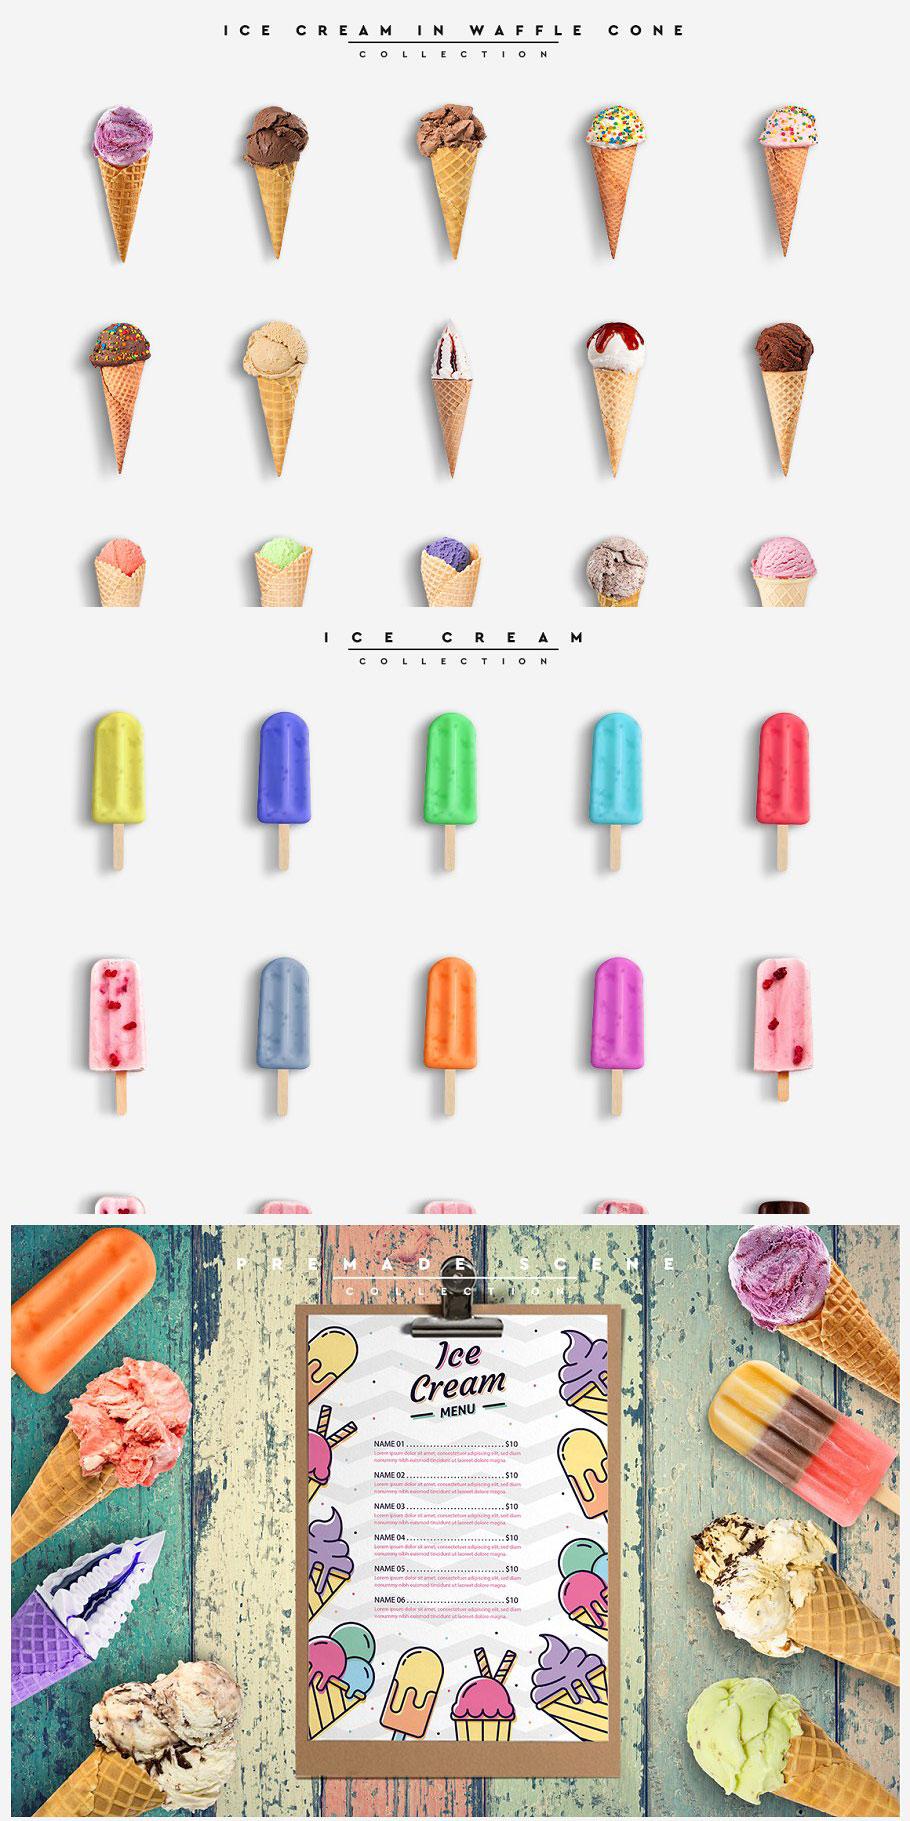 CreativeMarket Ice Cream Scene Creator %252301 4487477 Free Download